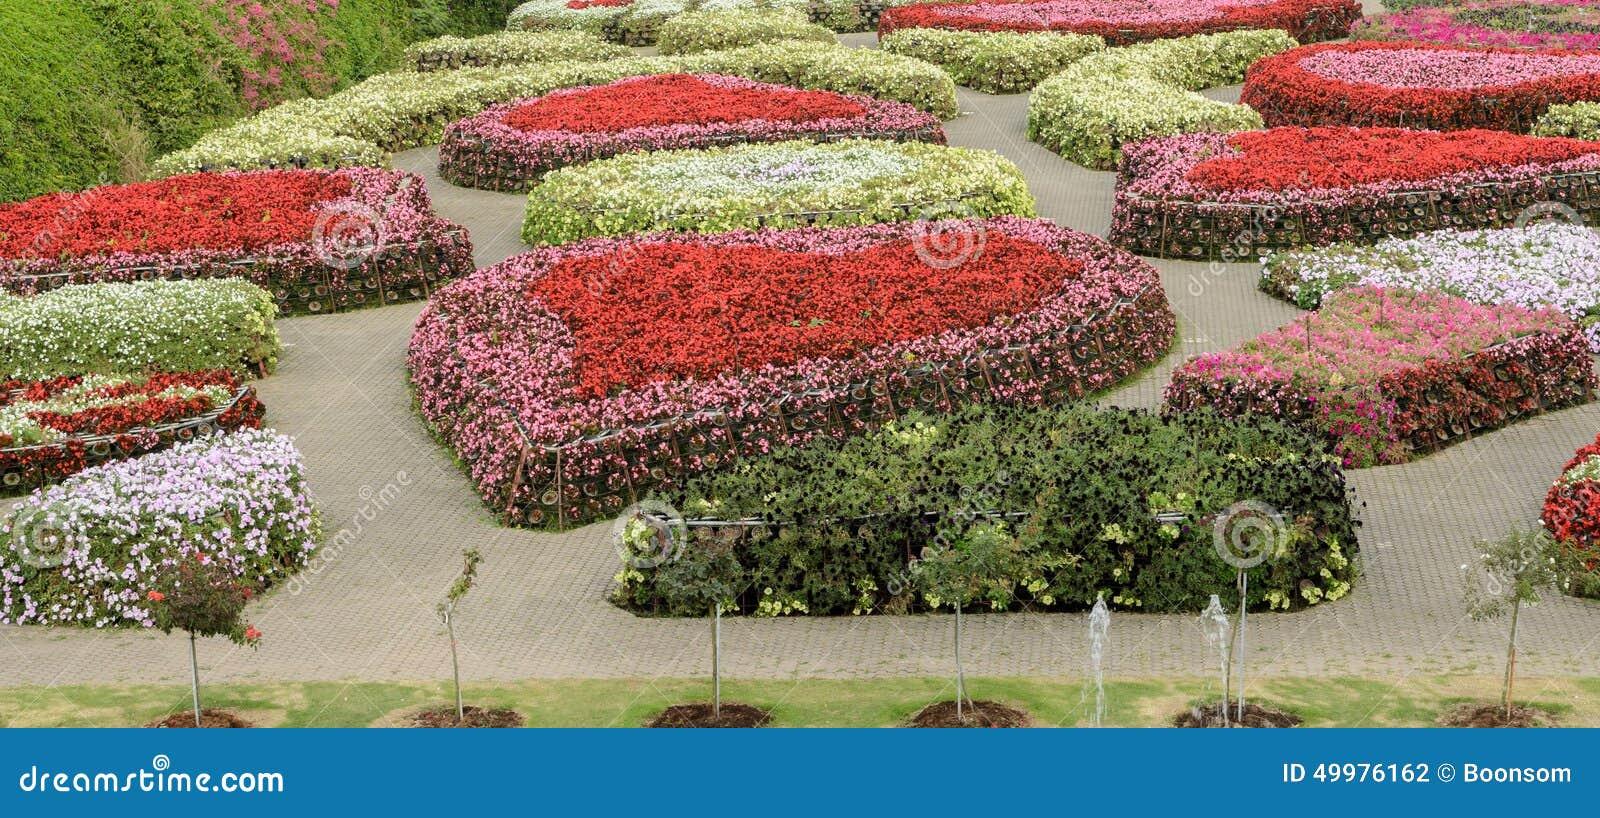 Ornamental flower garden 100 images incorporating for Ornamental trees for flower beds